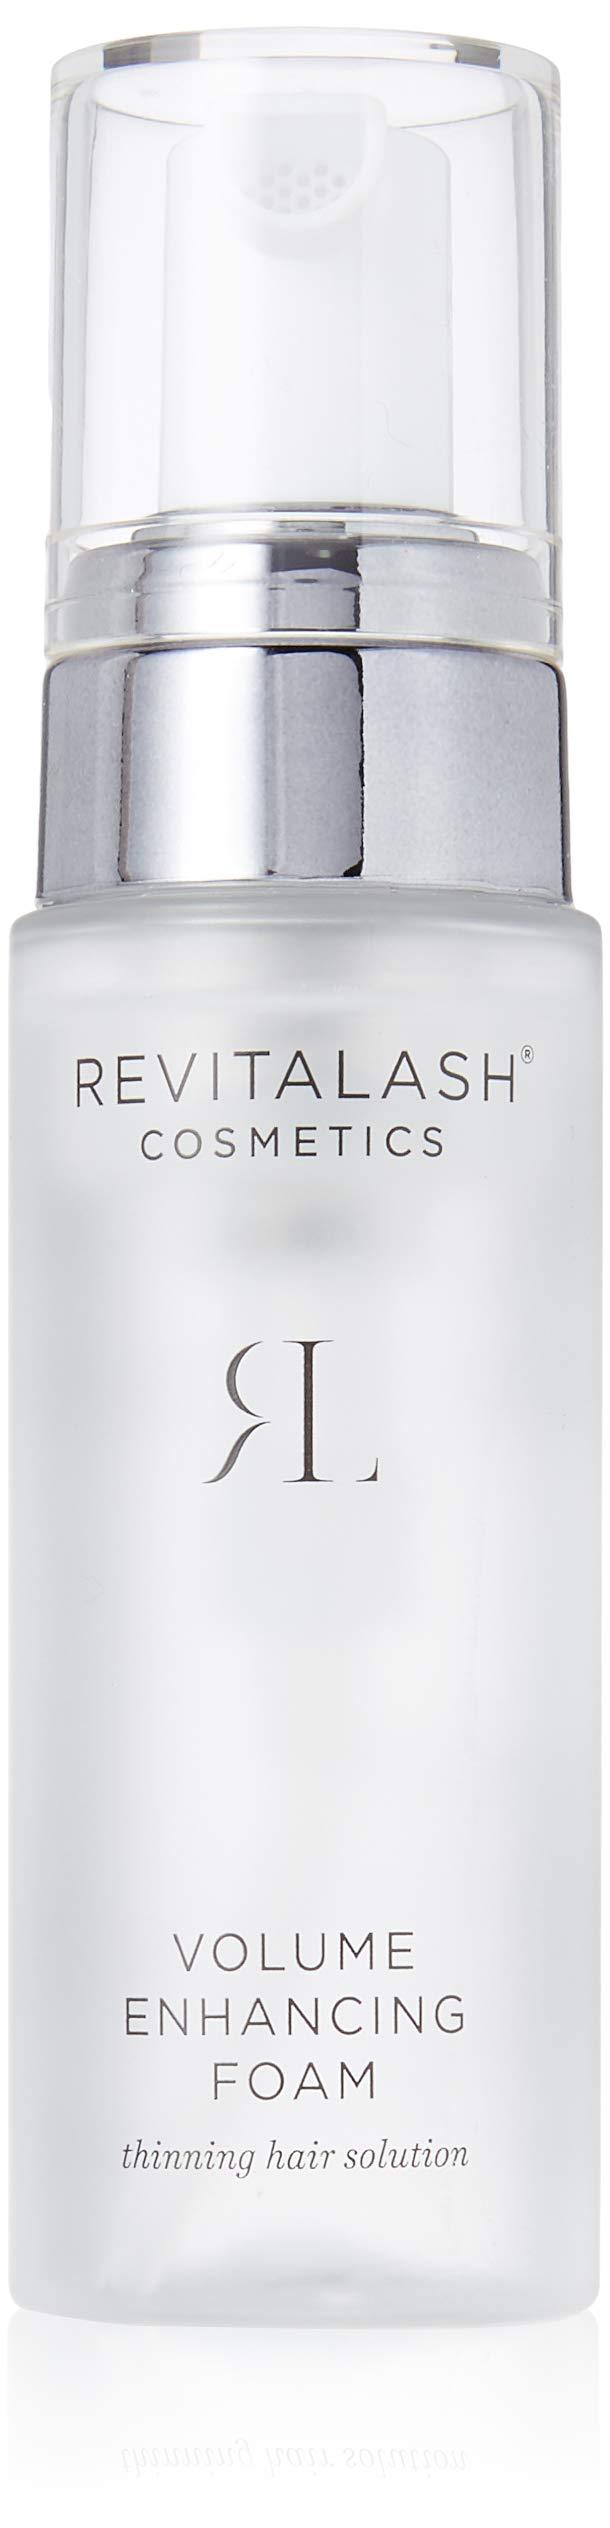 RevitaLash Cosmetics, Volume Enhancing Foam - Thinning Hair Solution, Physician Developed & Cruelty Free by RevitaLash Cosmetics